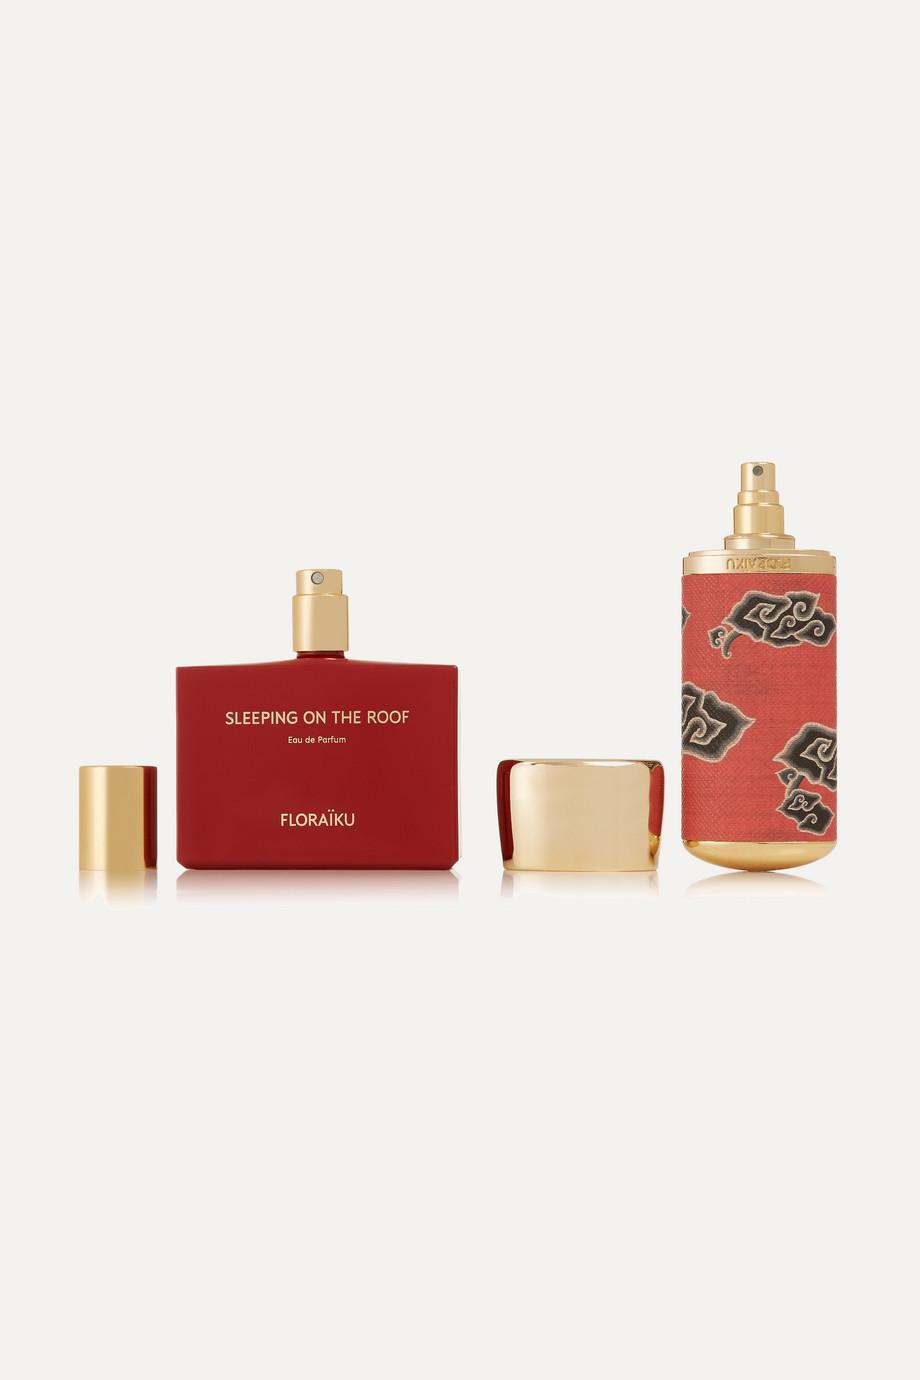 Floraiku Sleeping on the Roof – Set aus Eaux de Parfum